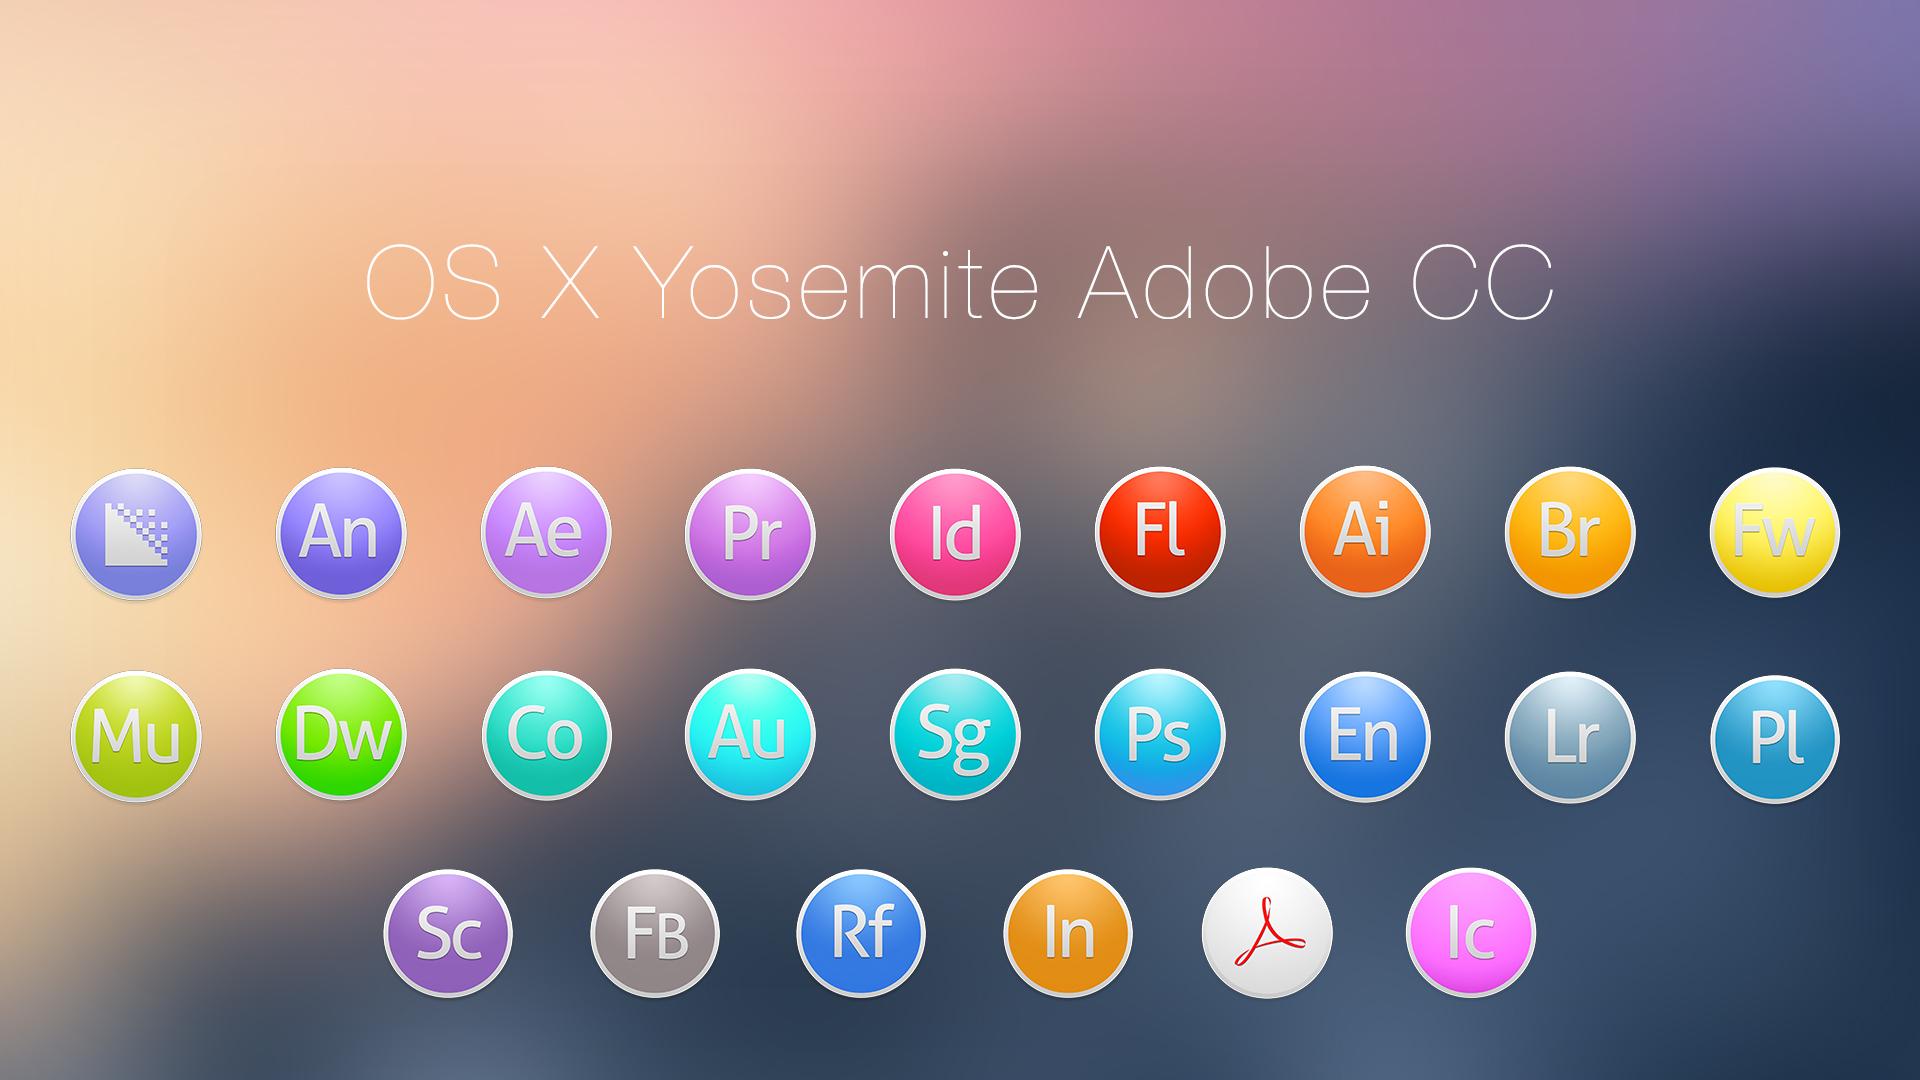 OS X Yosemite Adobe CC Light